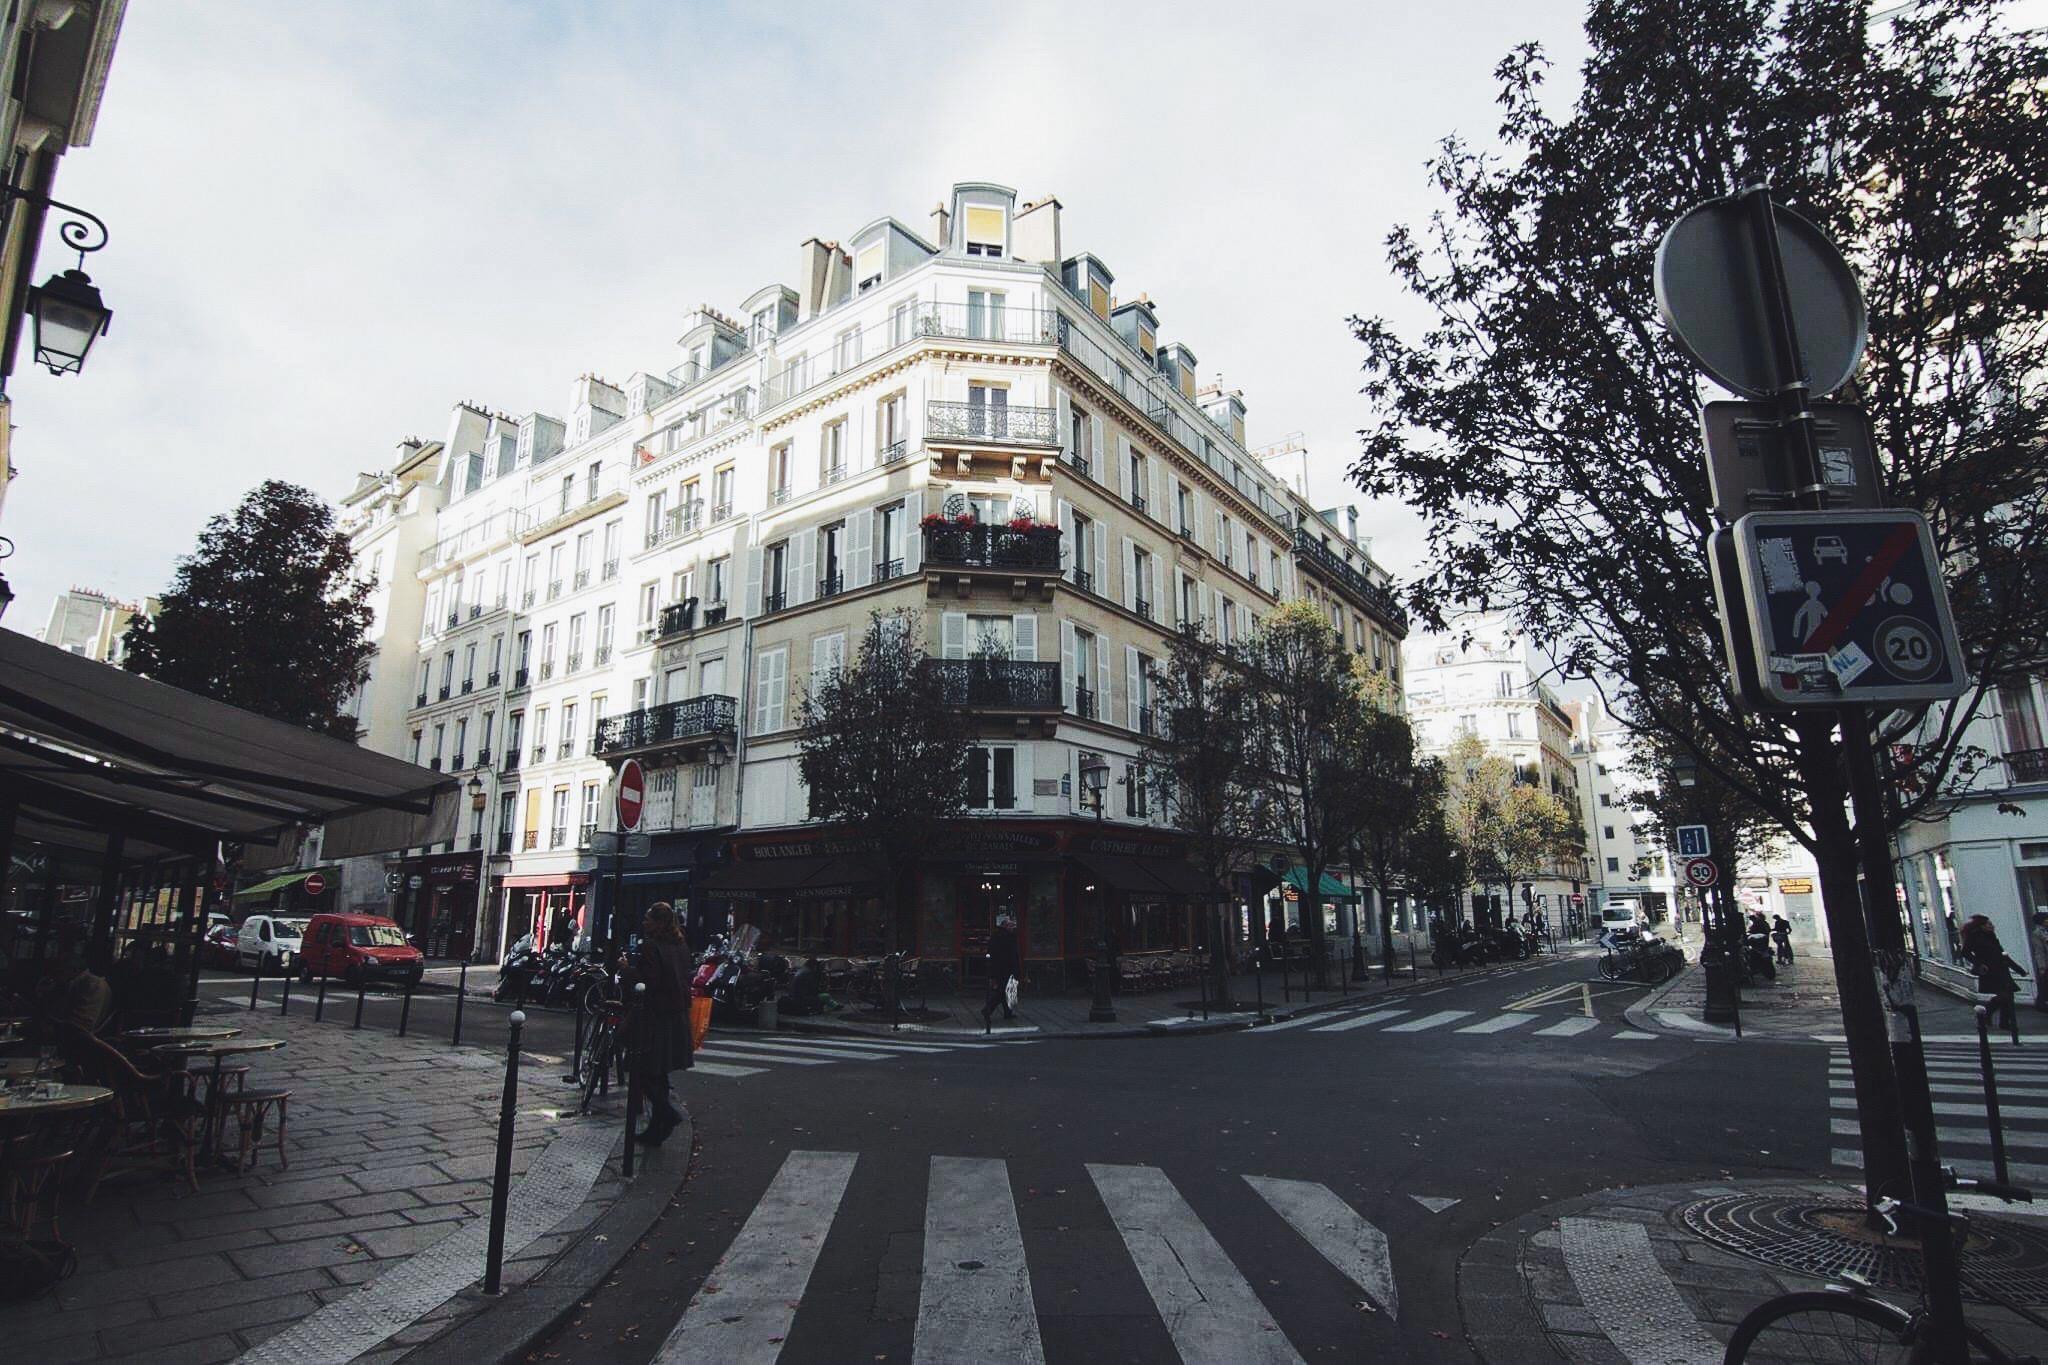 European Street Picture